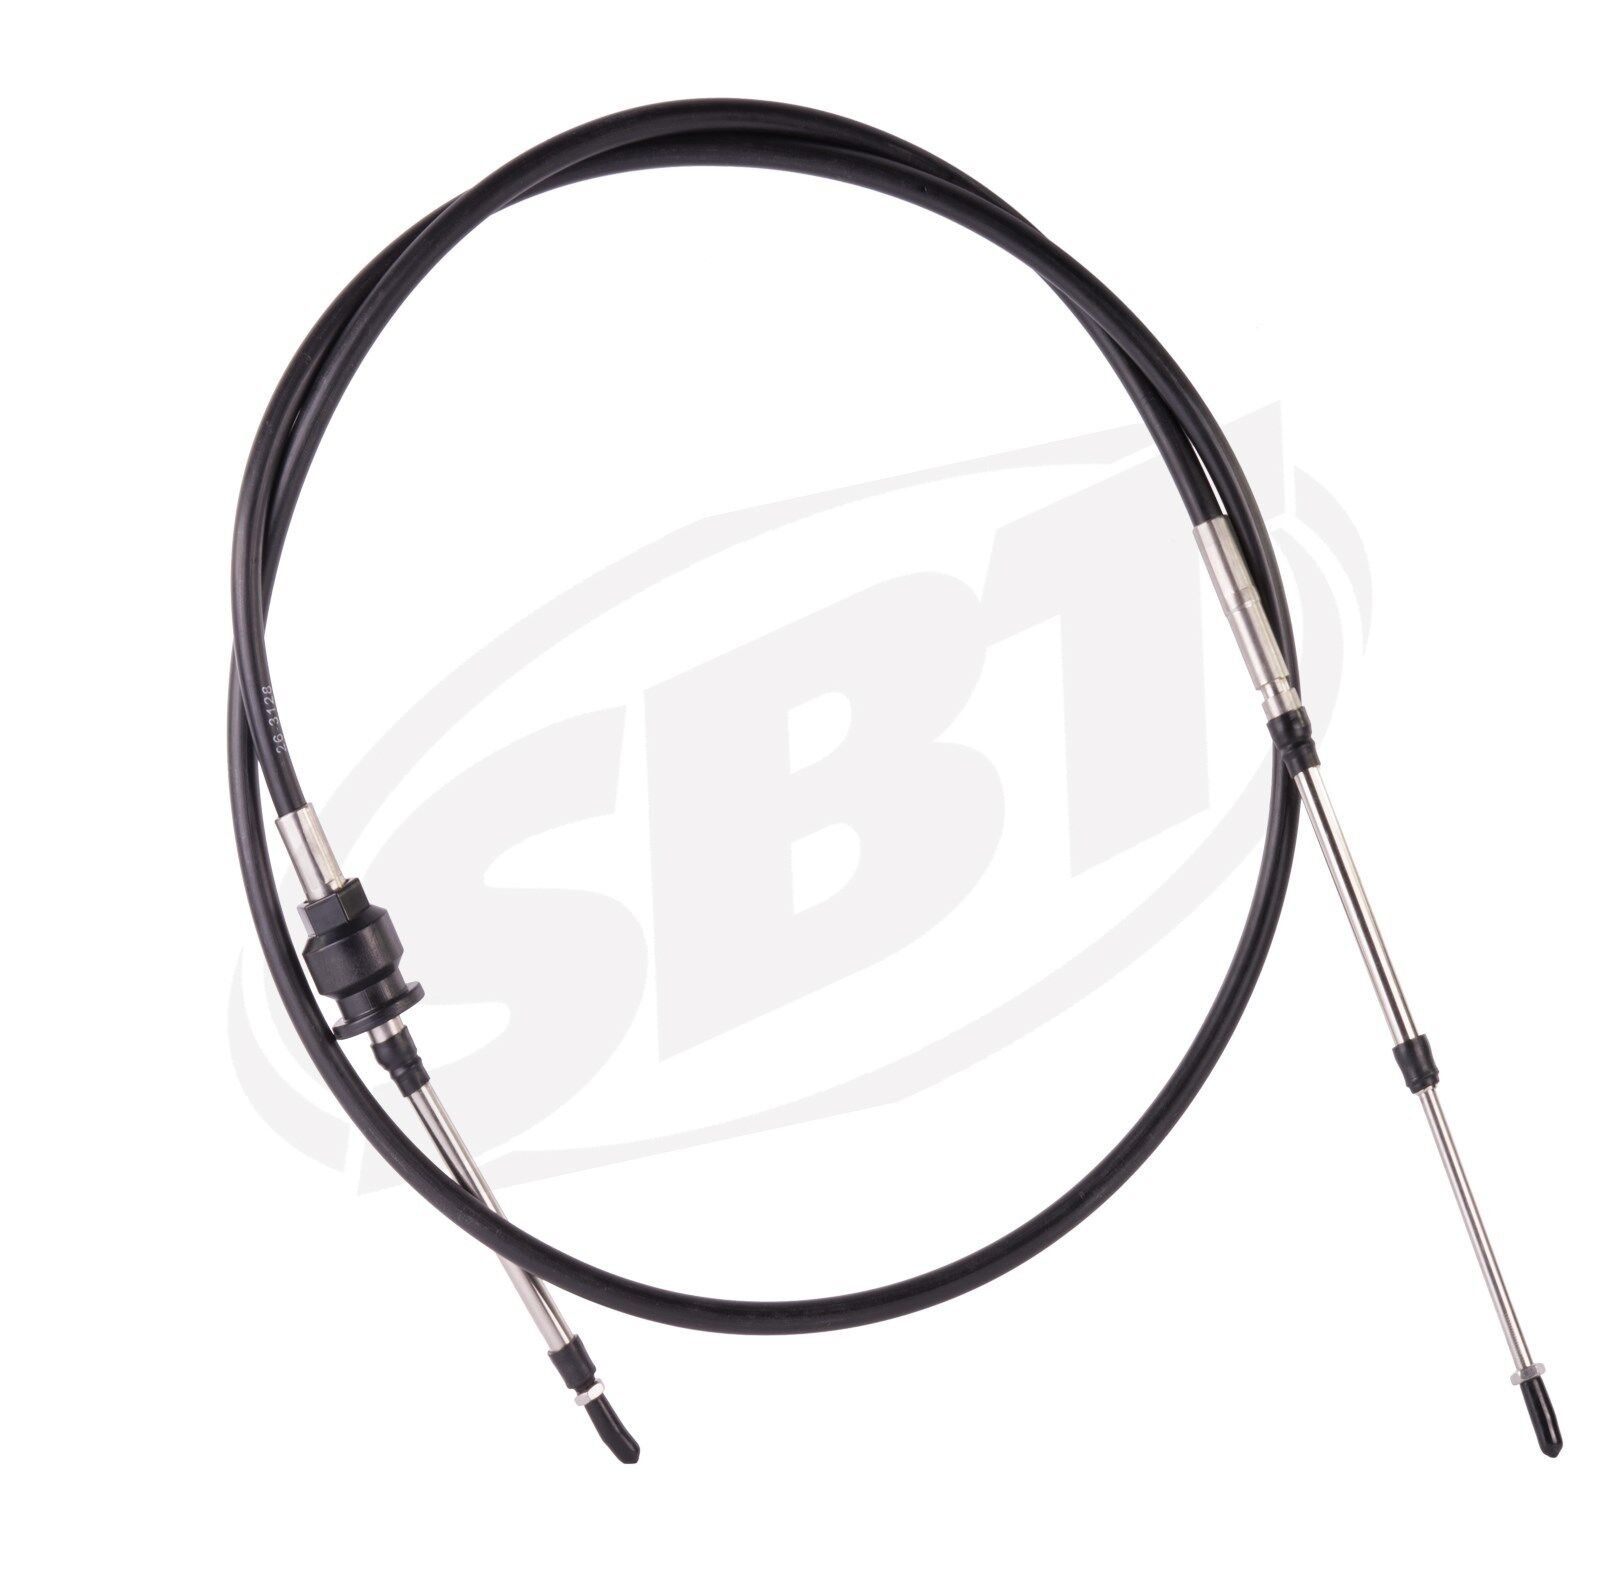 SeaDoo Steering Cable GTX 277000843 2000 2001 2002 2003